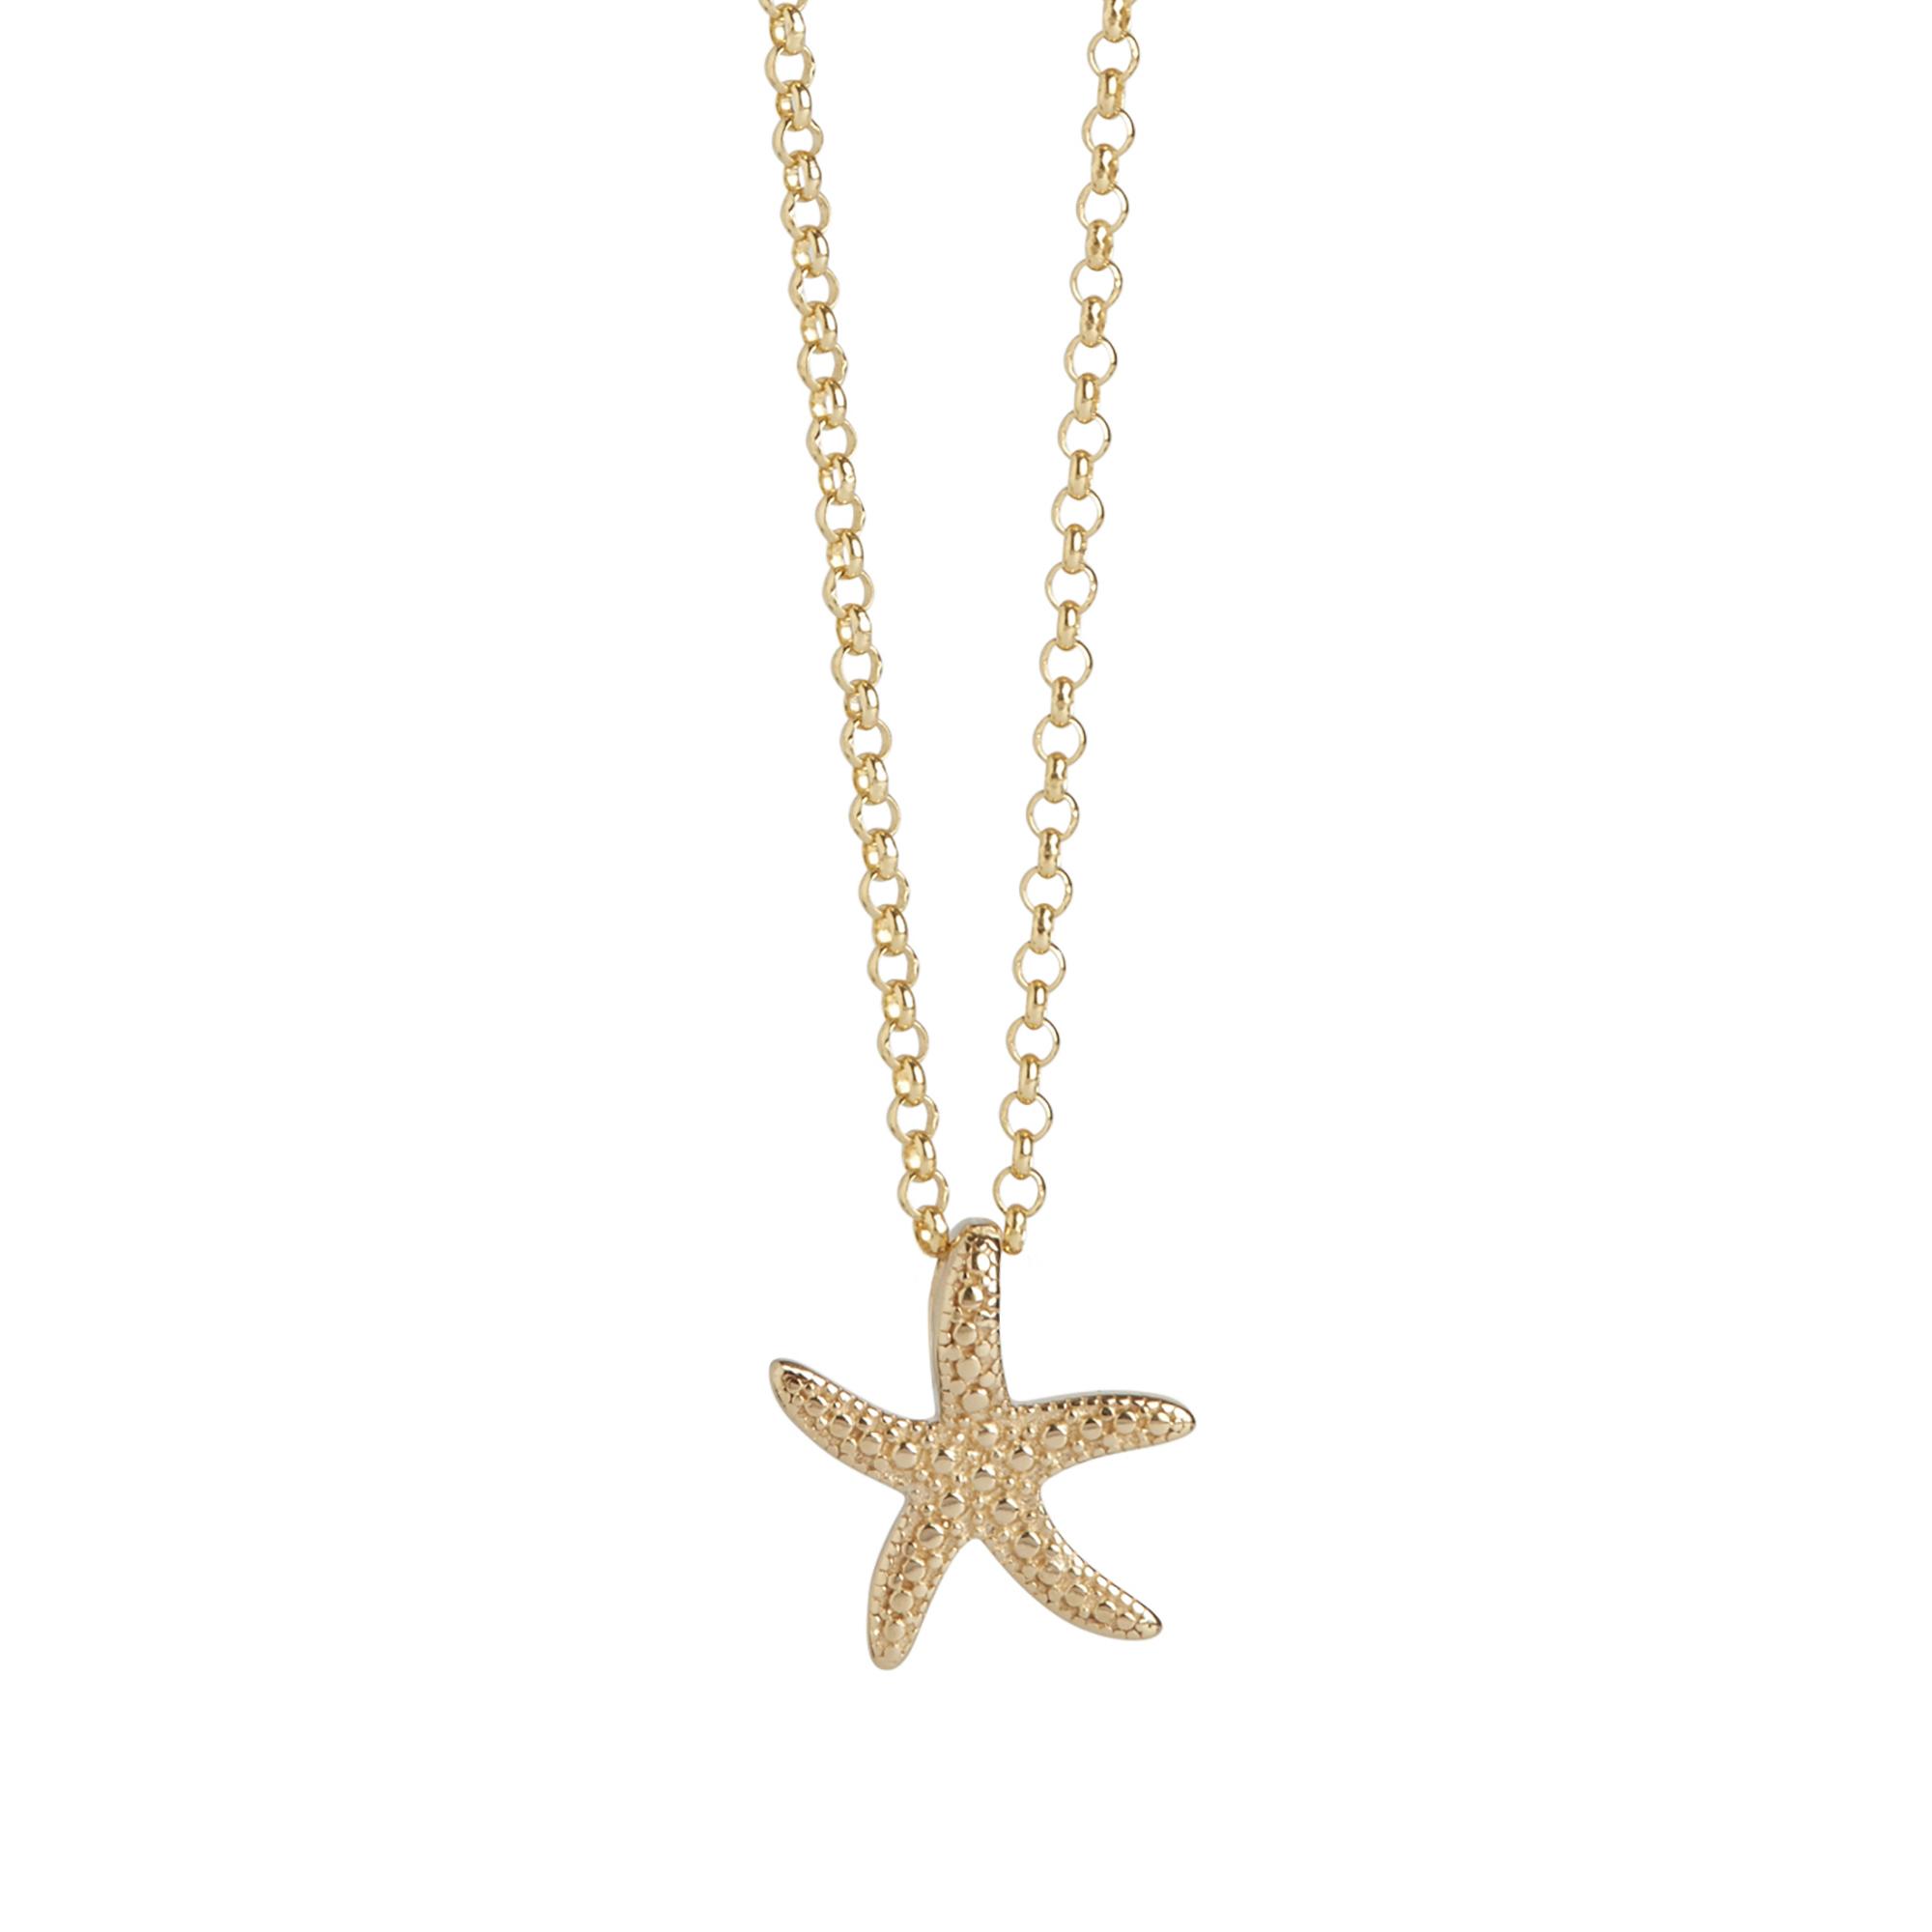 Muru Starfish Charm Necklace Gold Plated